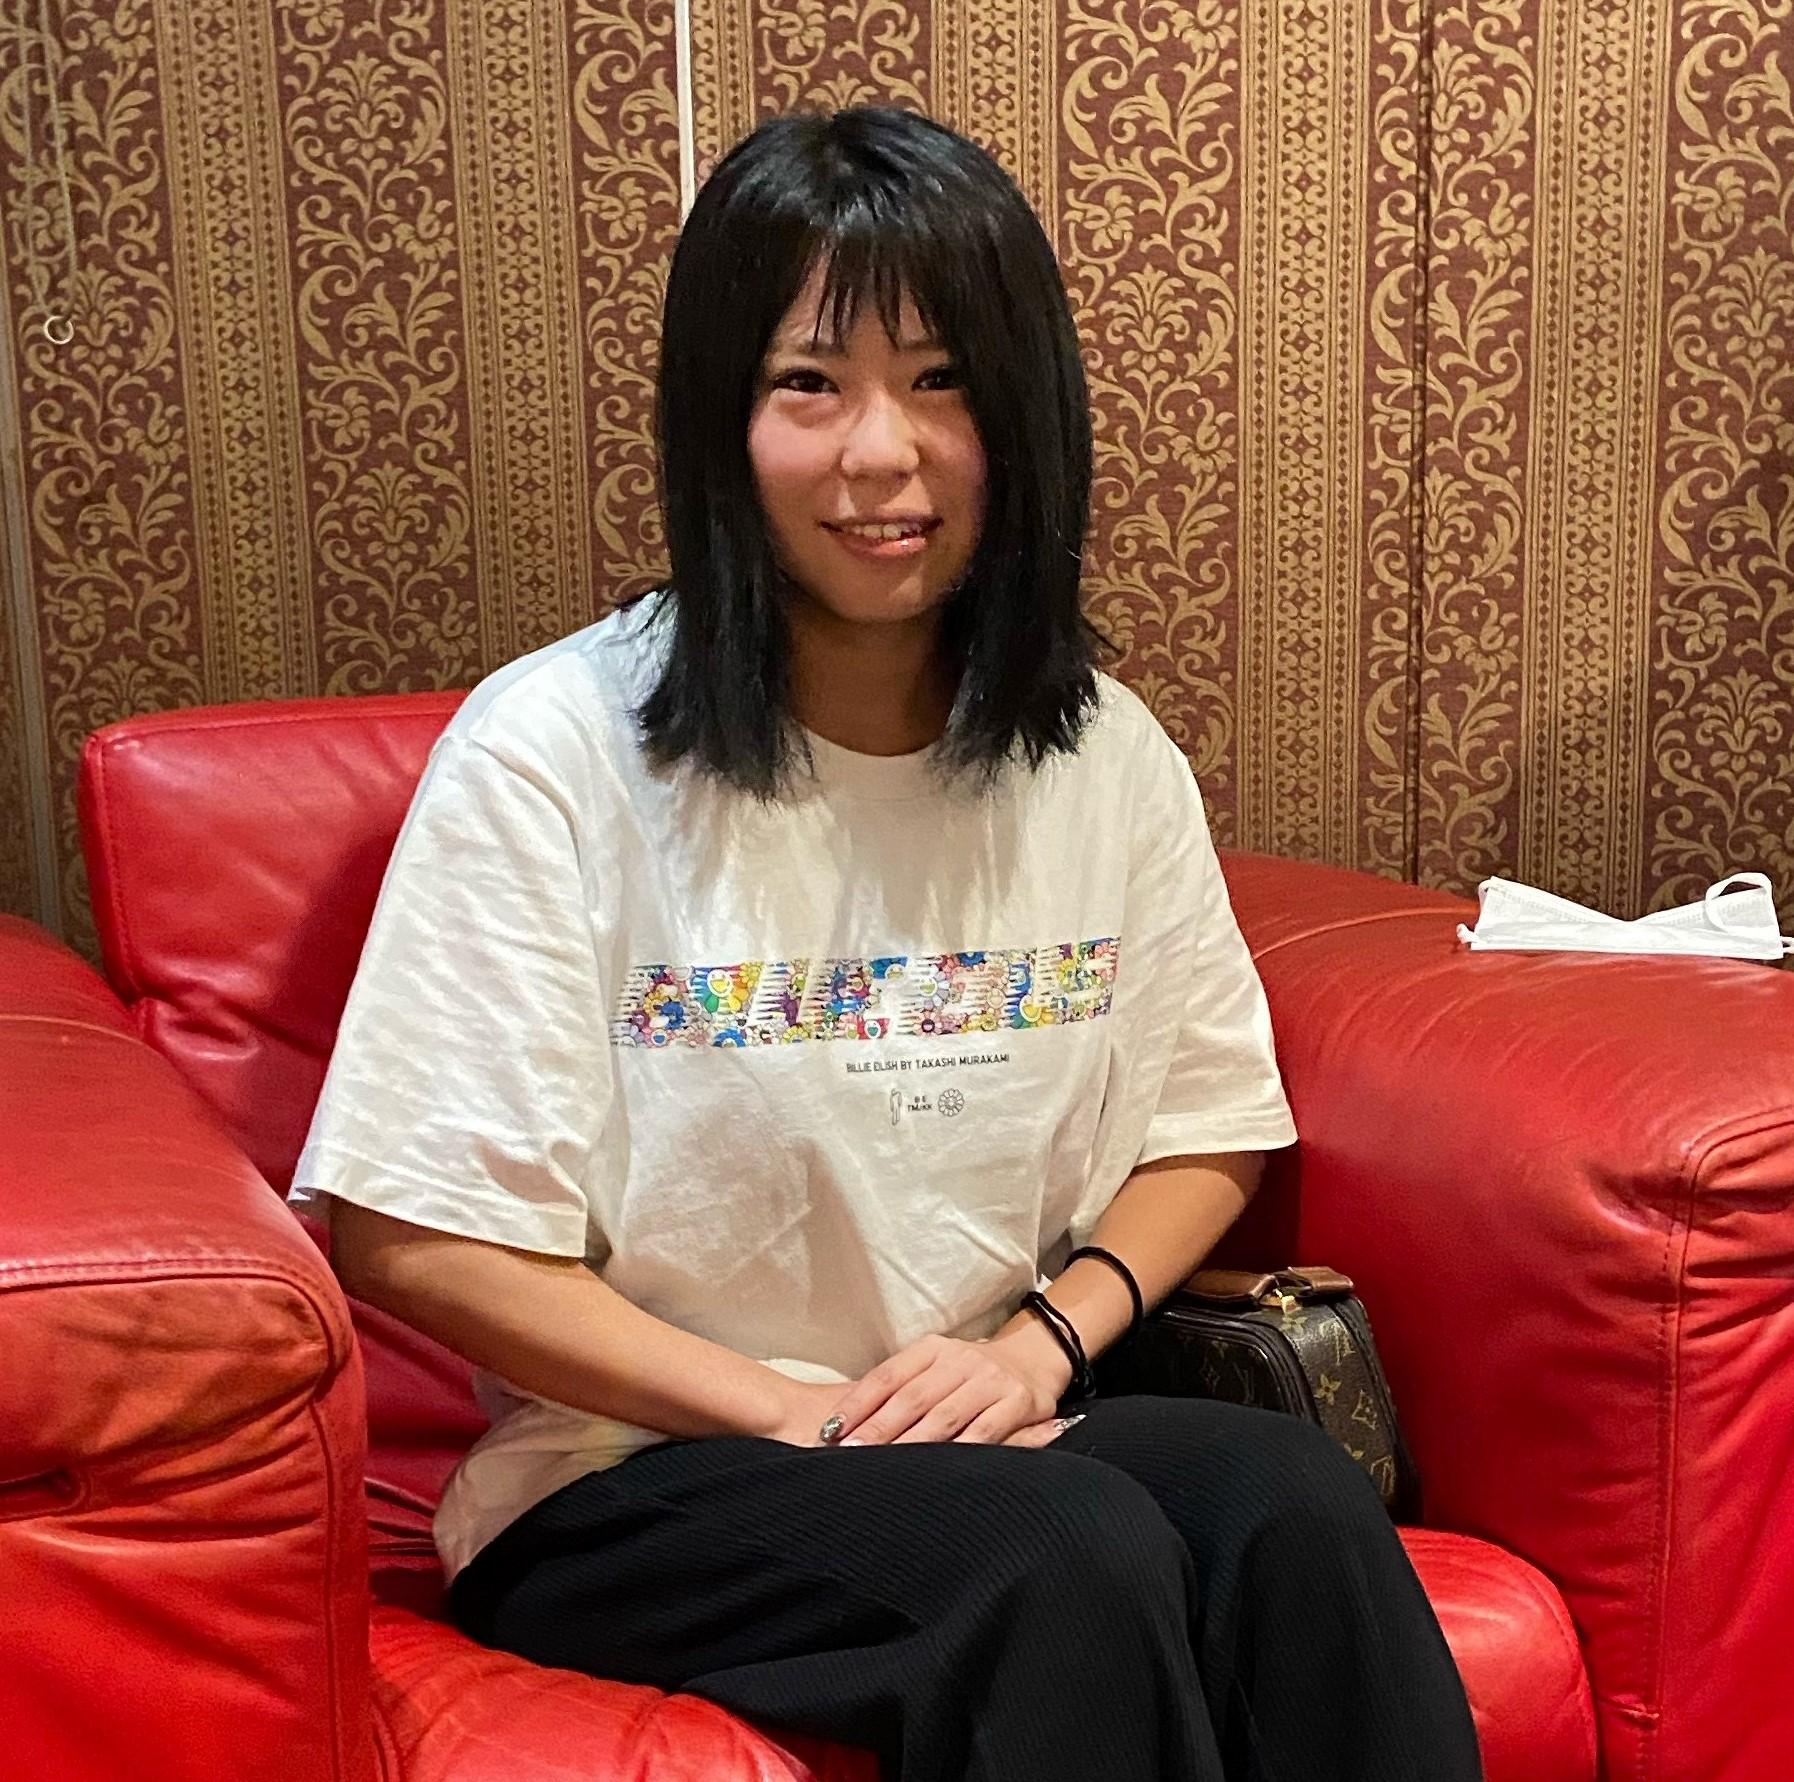 元救命士からの飲食業界参入 代表取締役社長 小野様